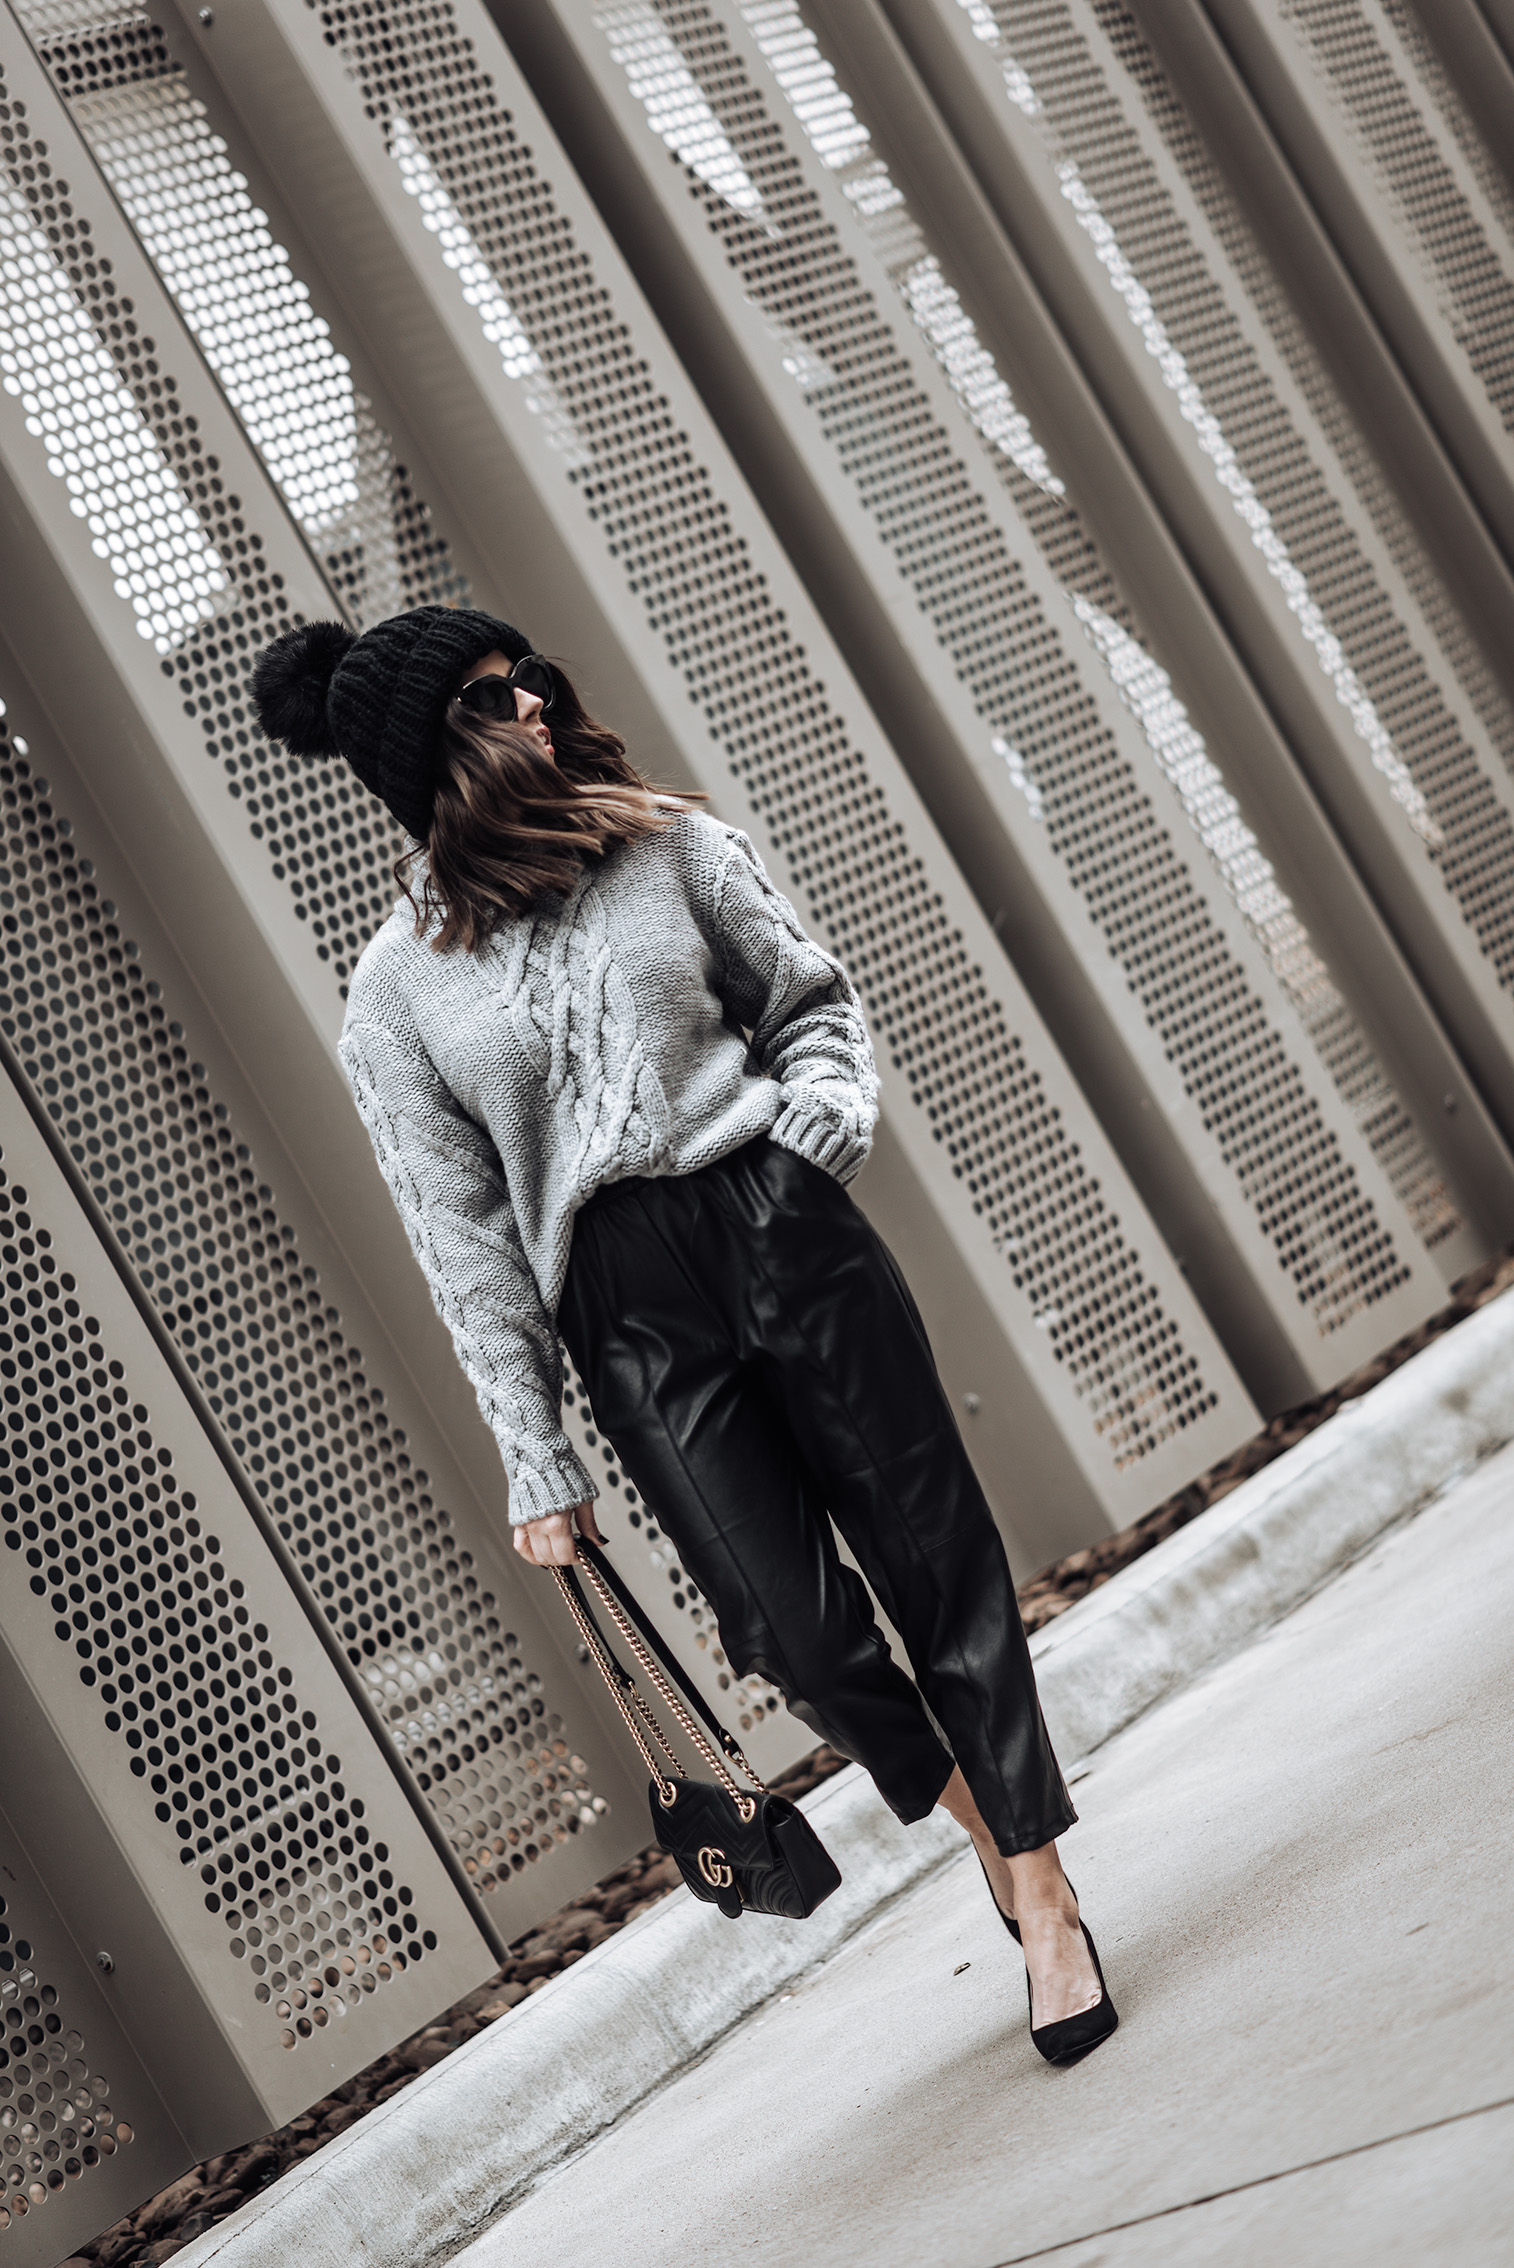 Tiffany Jais fashion and lifestyle blogger of Flaunt and Center   Houston fashion blogger   Leather joggers   Streetstyle blog   Grey chunky knit sweater (similar)   Leather pant   Mini GG Marmot bag   Oversized chunky knit beanie (sold out similar here) #streetstyle #blog #chunkysweater